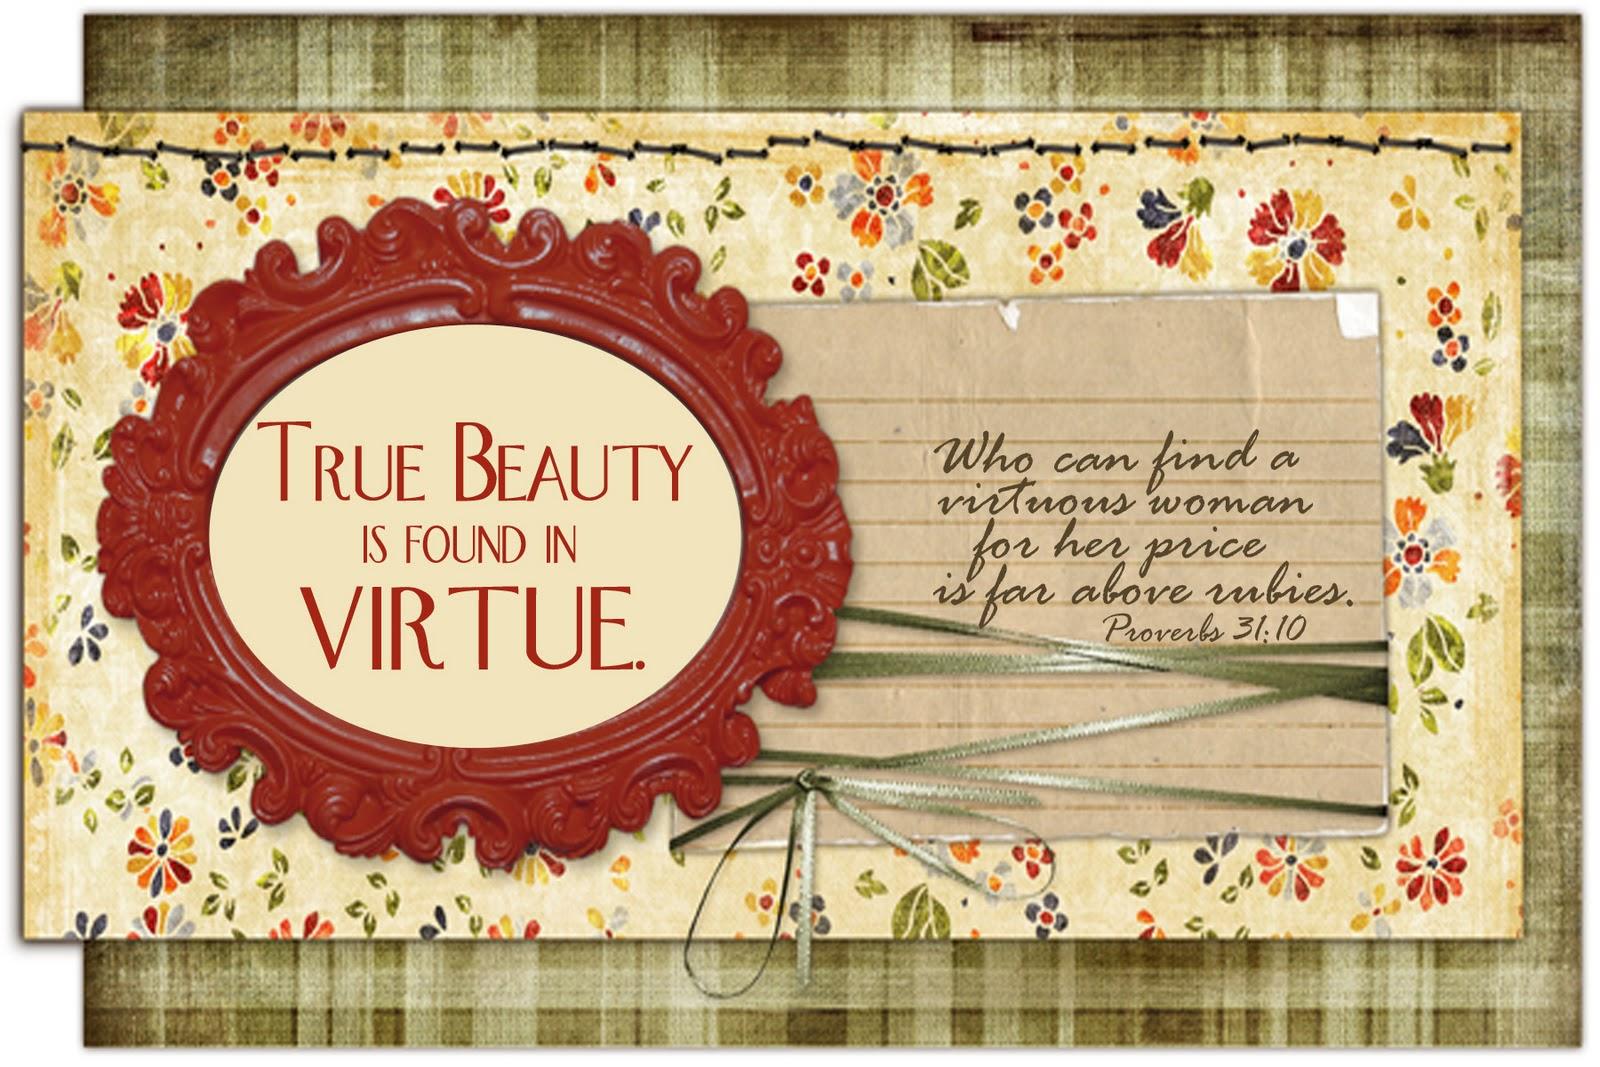 Virtue quote #5